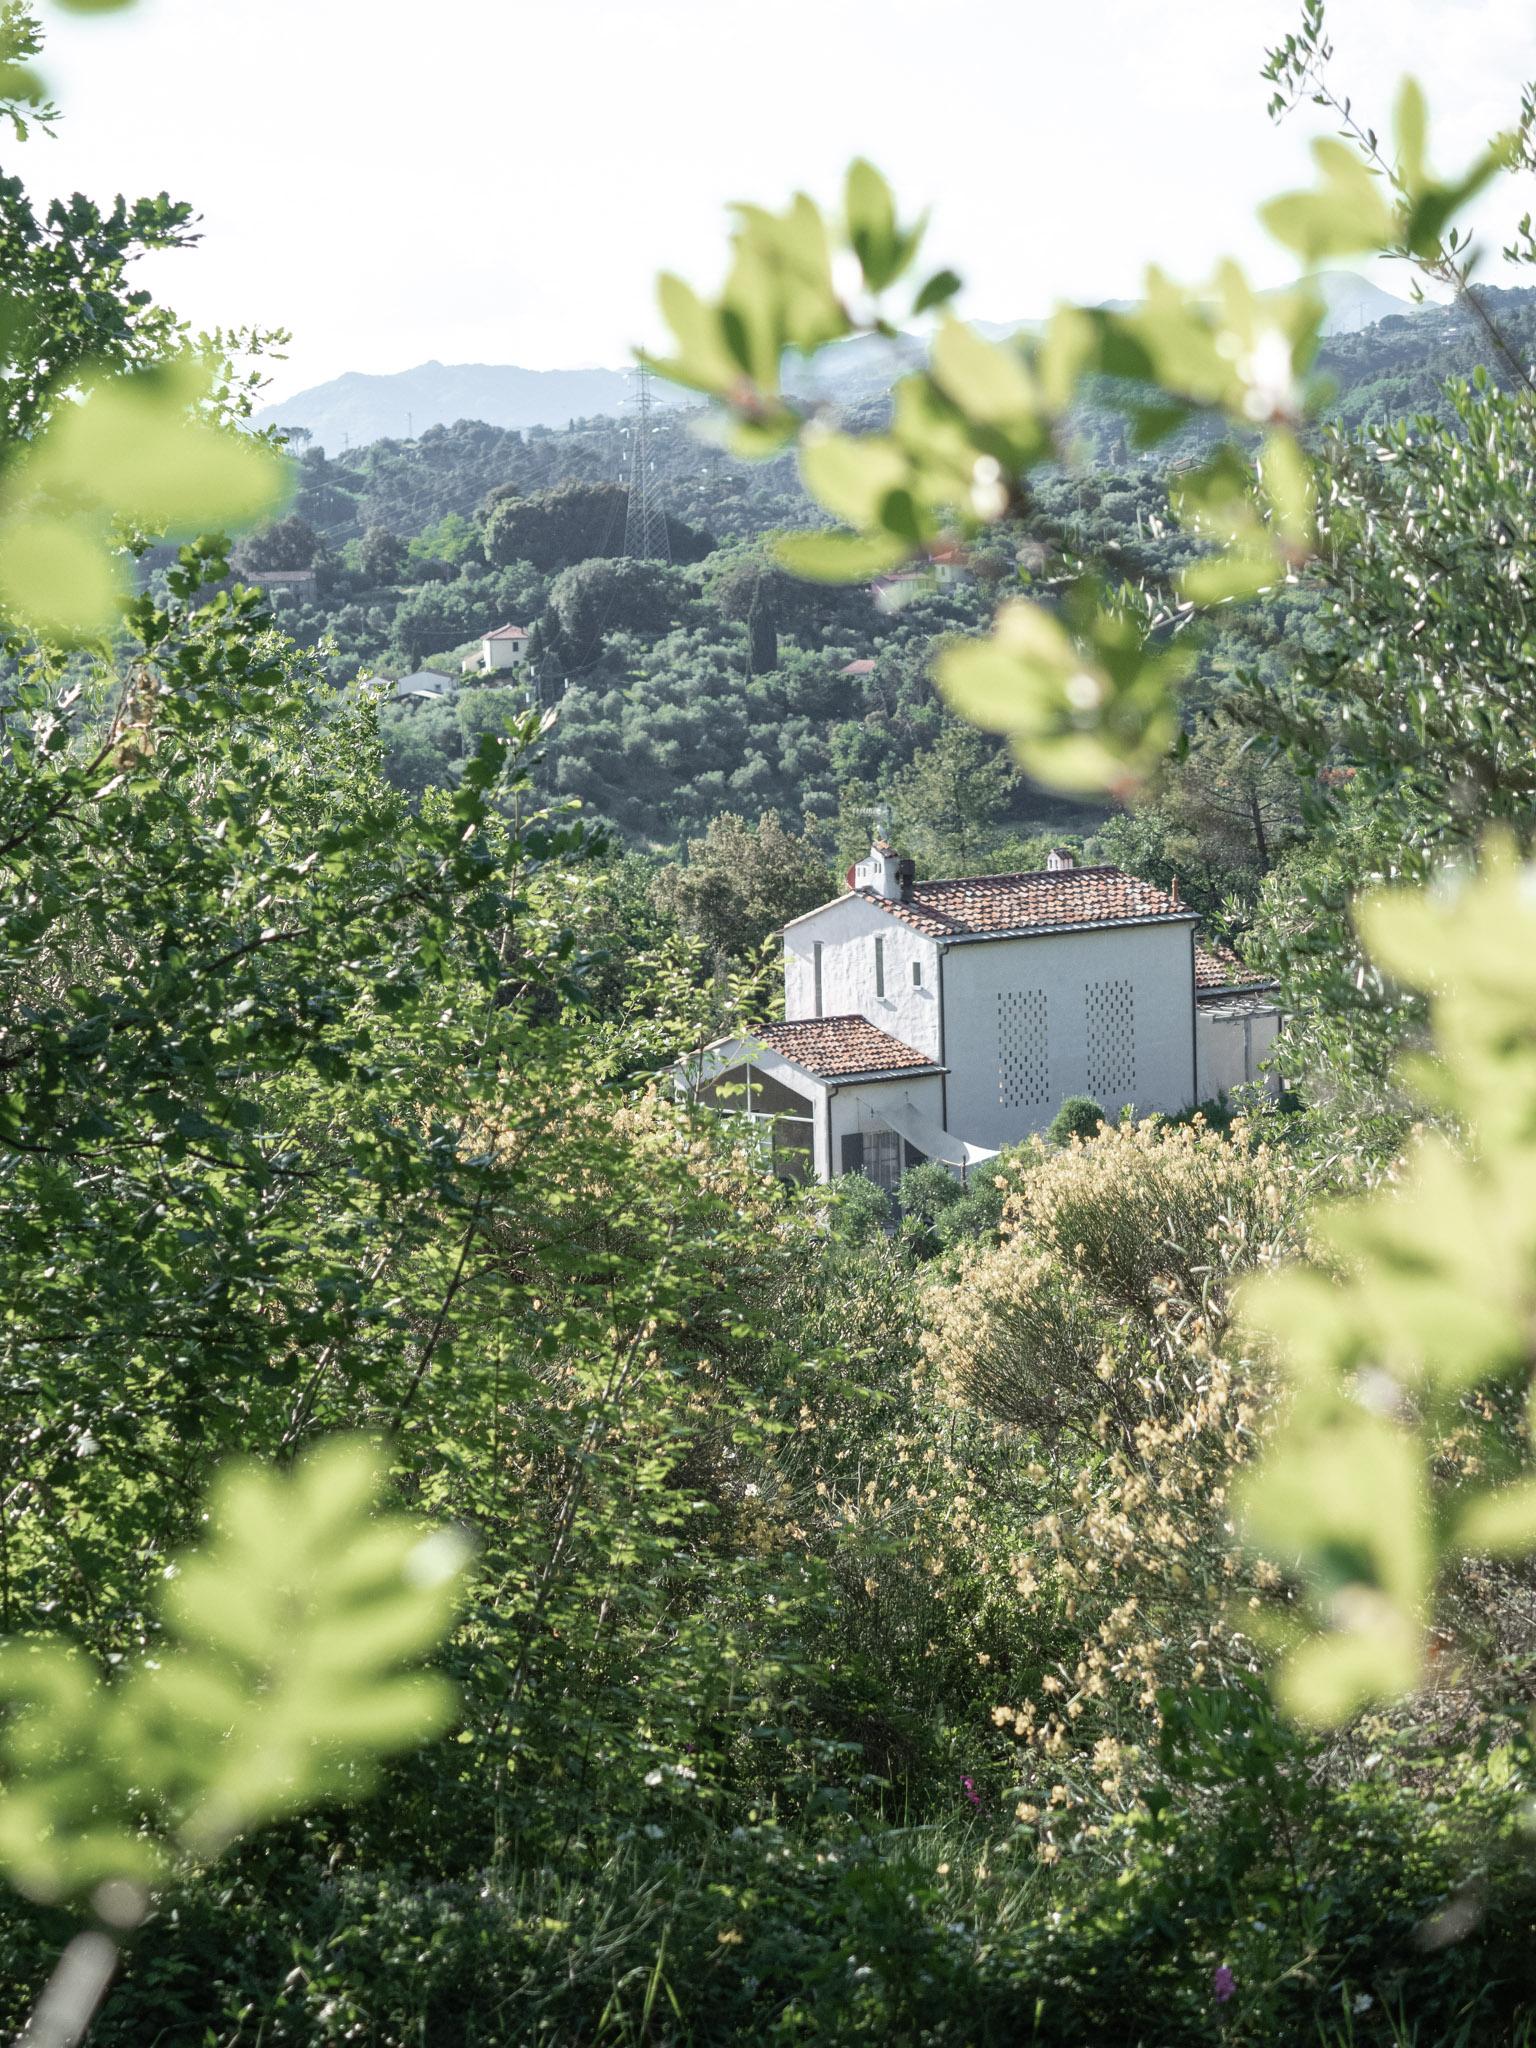 La Fustaia, Bed & Breakfast charme, Liguria